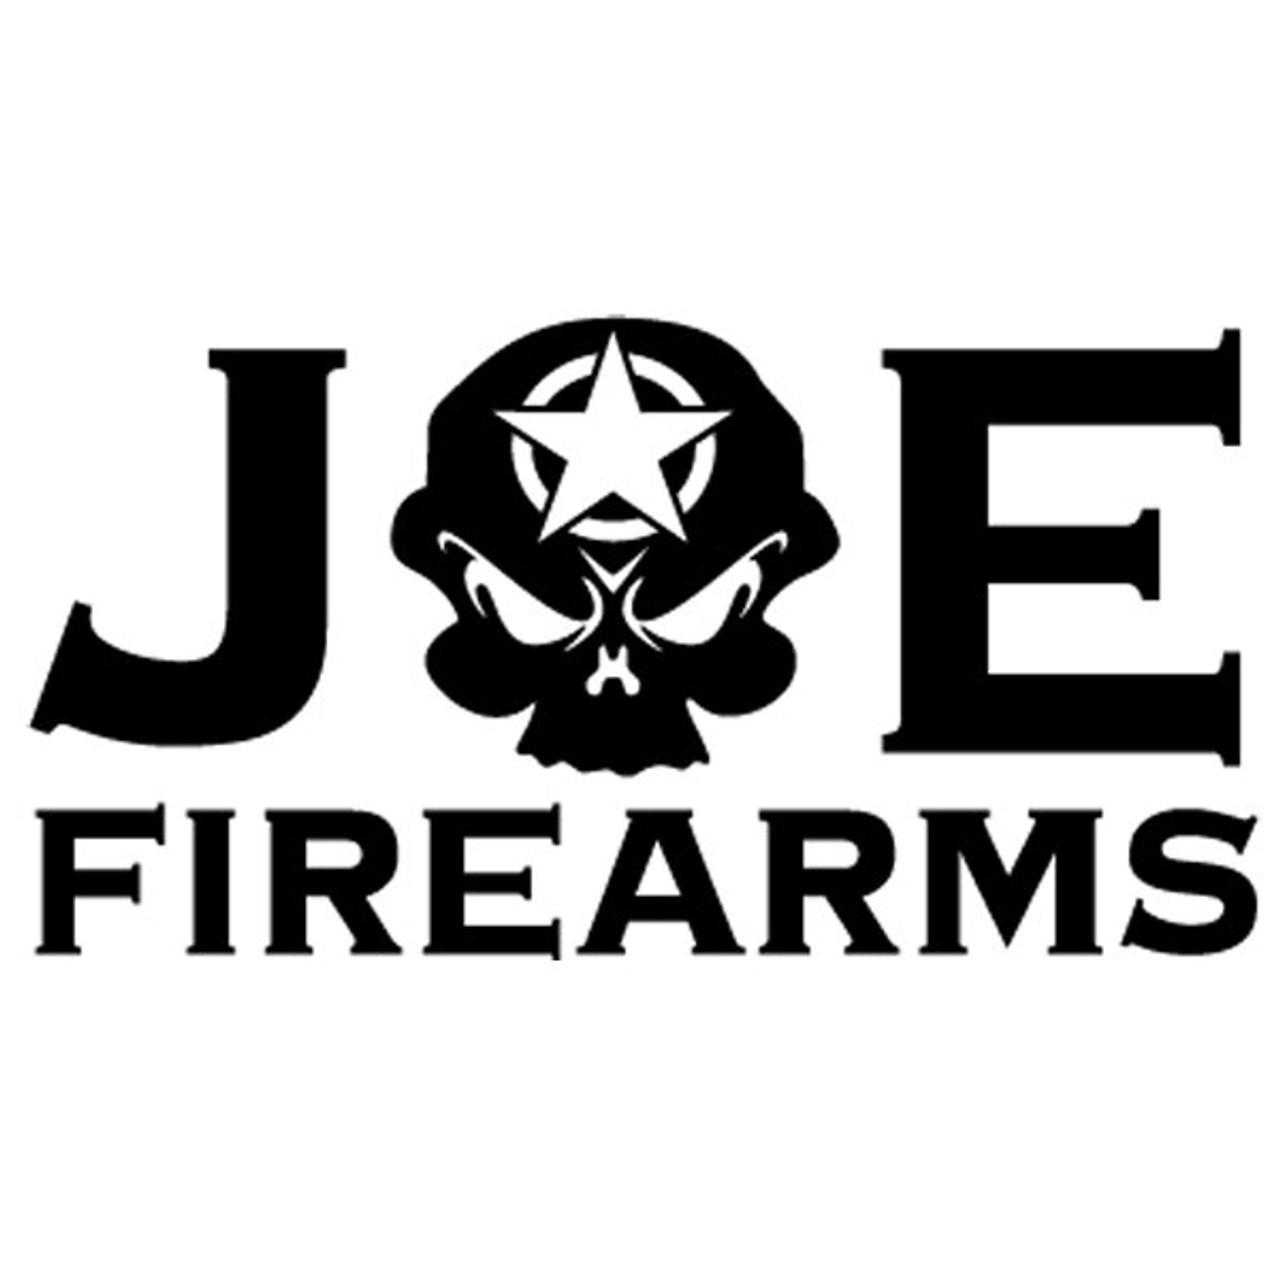 "Hogue Knives Vietnam Tiger Stripe EX-A01 3.5"" Auto Knife, Tumbled Blade JOE FIREARMS VIEW"